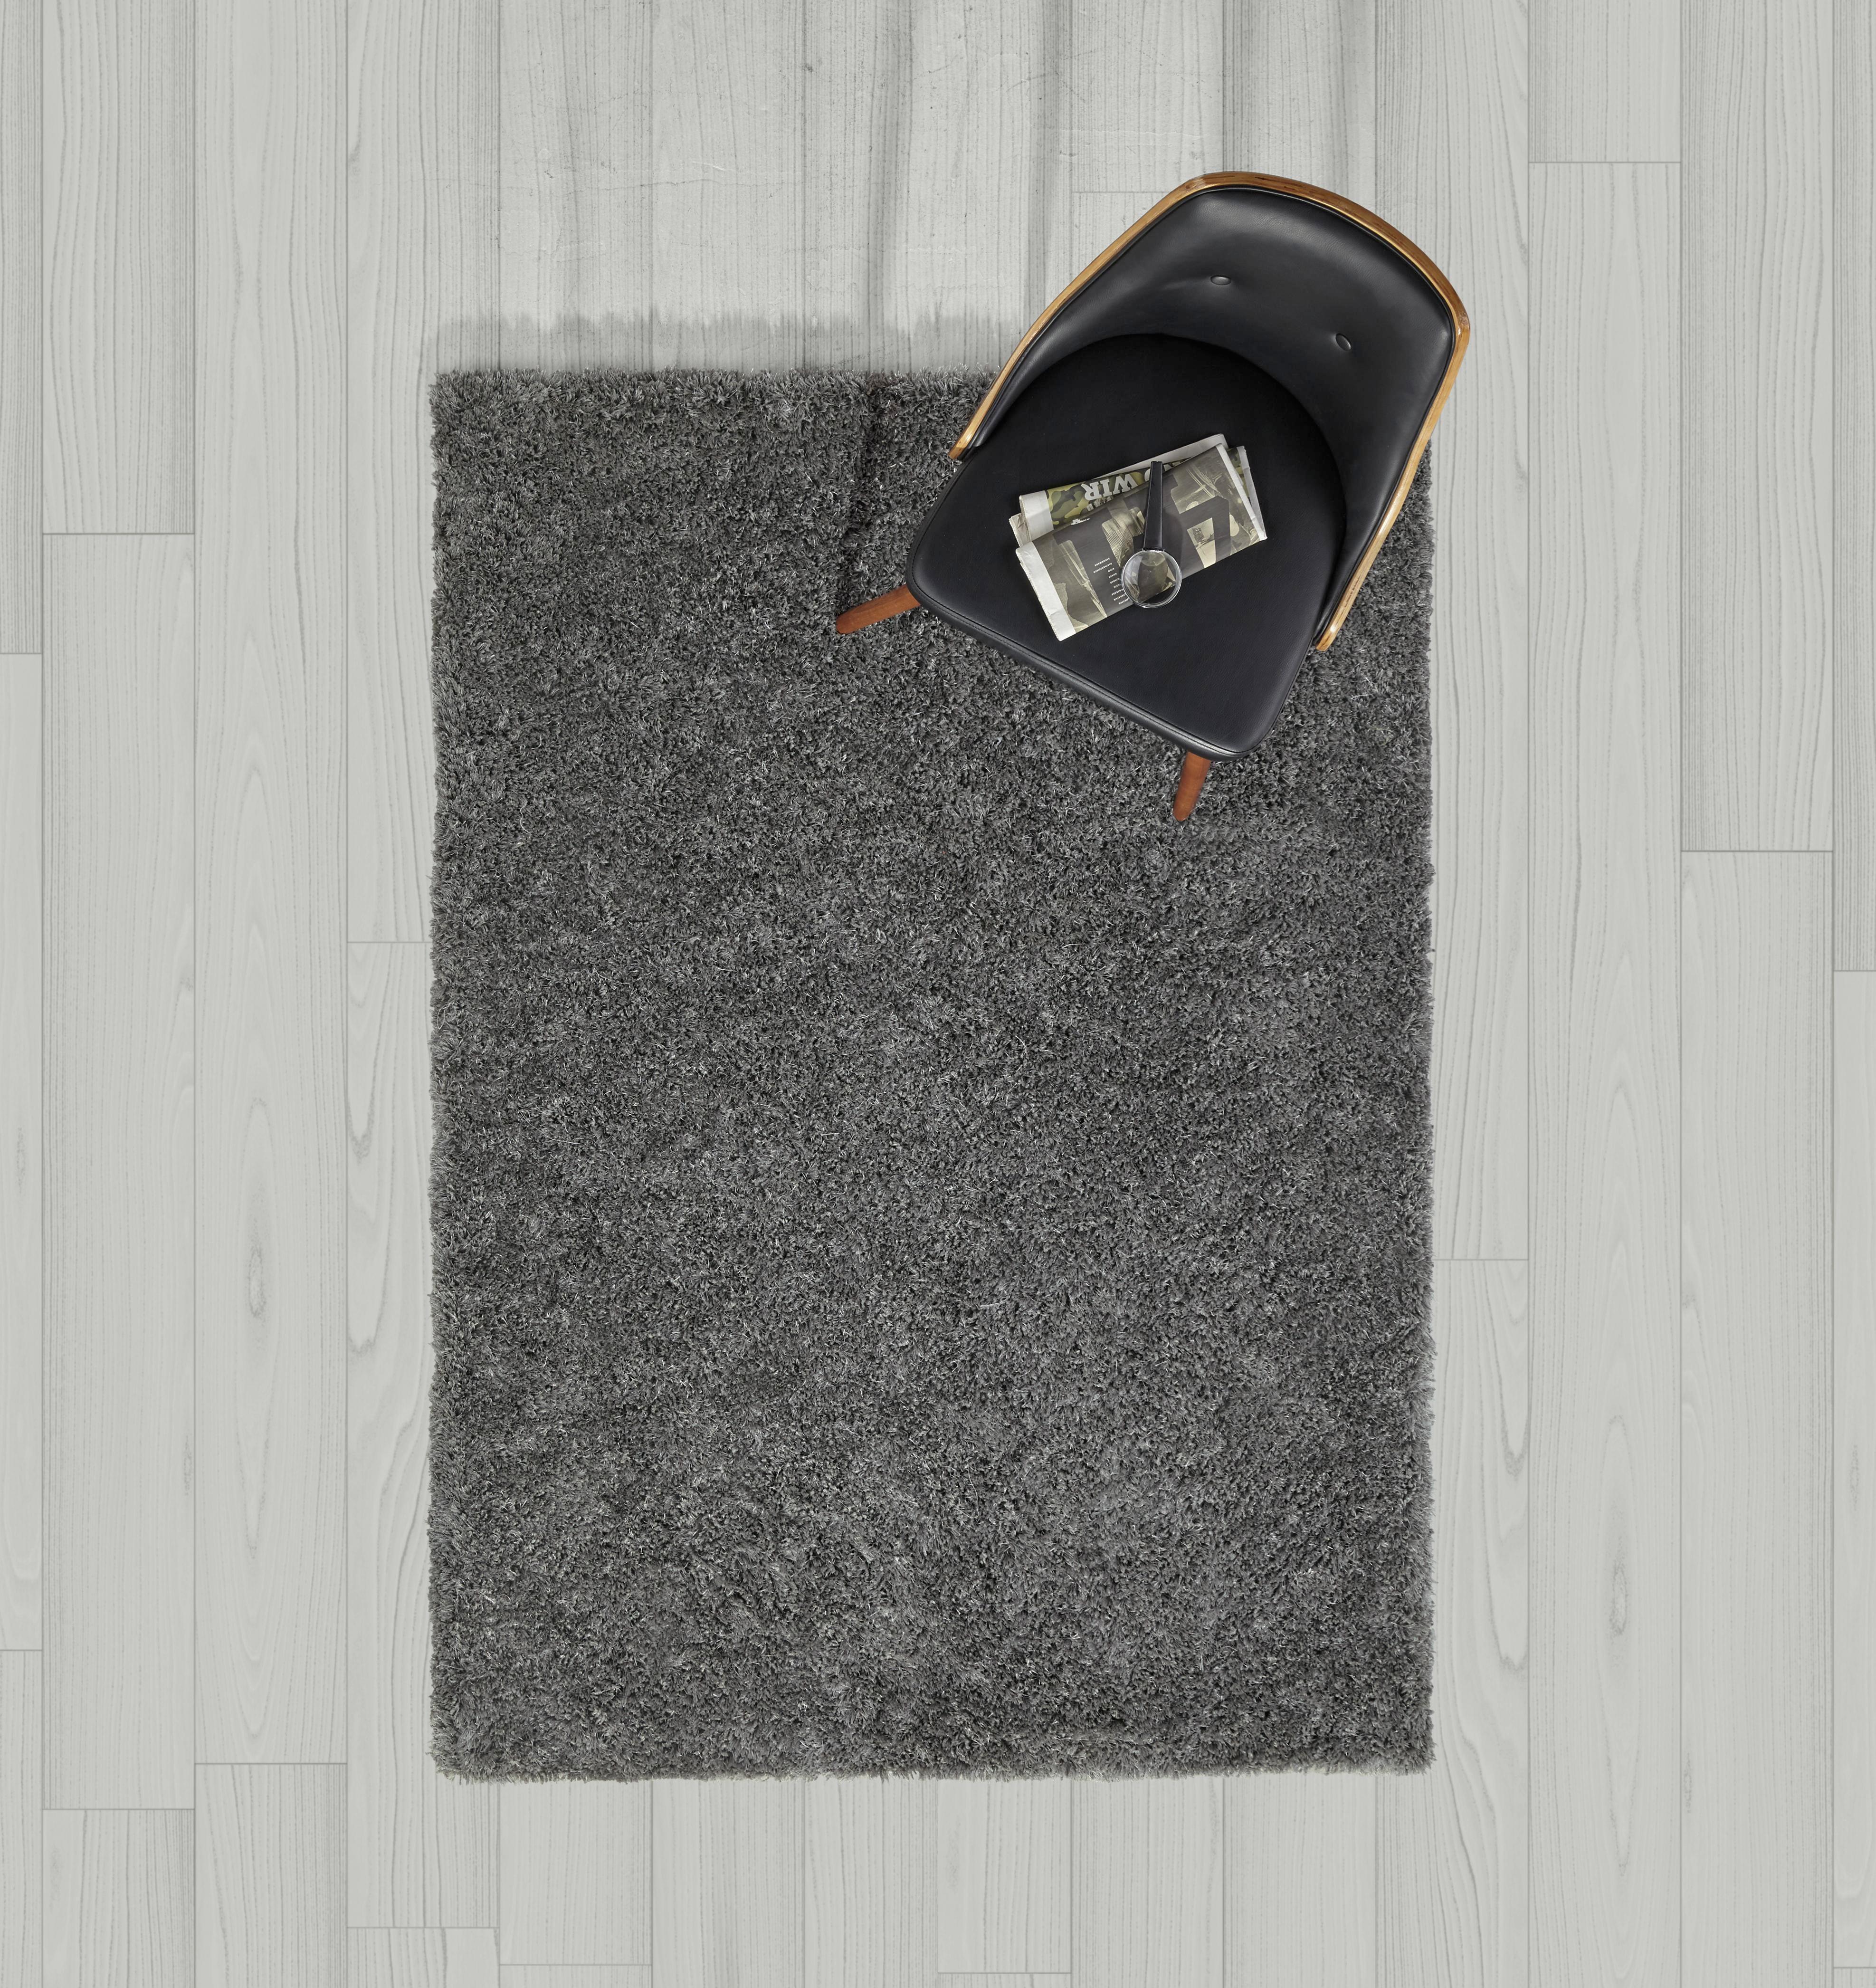 Hochflorteppich Shaggy 120x170cm - Dunkelgrau, MODERN, Textil (120/170cm) - MÖMAX modern living